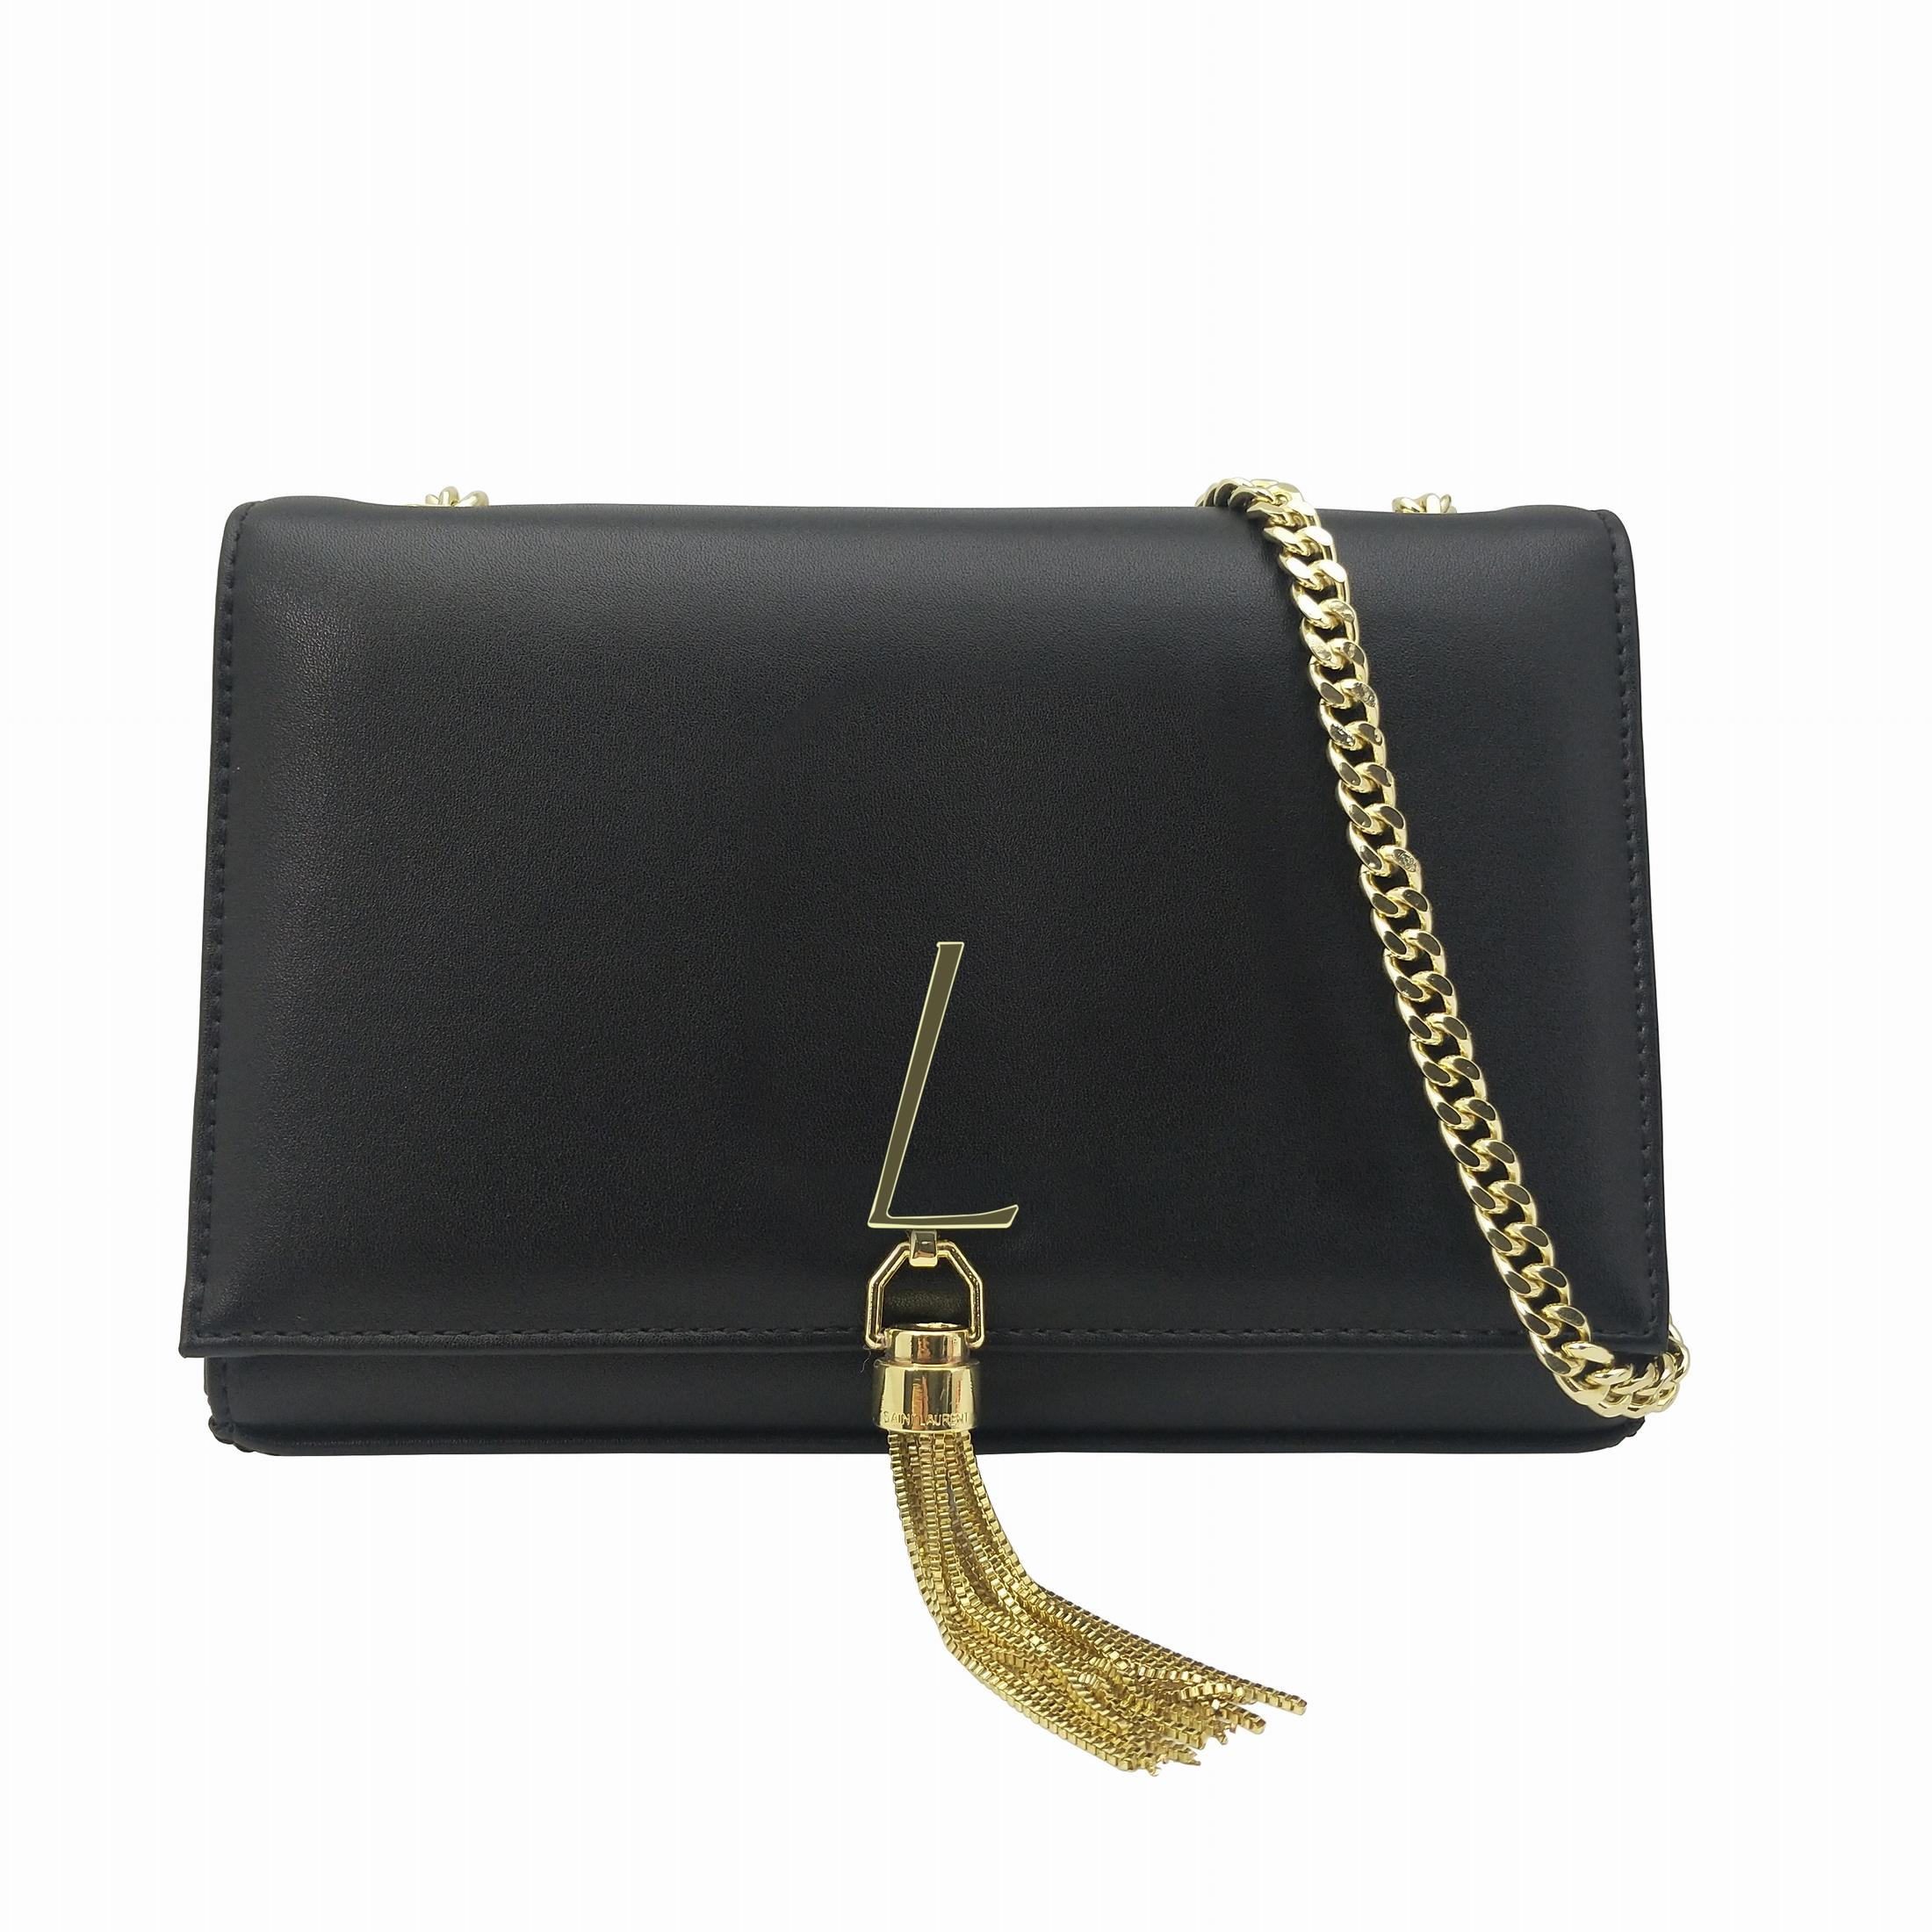 Moda Mulheres Ombro Kate Bags Bolsa de Ouro Corrente Crossbody Bags Alta Qualidade Couro Embraiagem Sacos Borla Totes Messenger Saco Mochilas